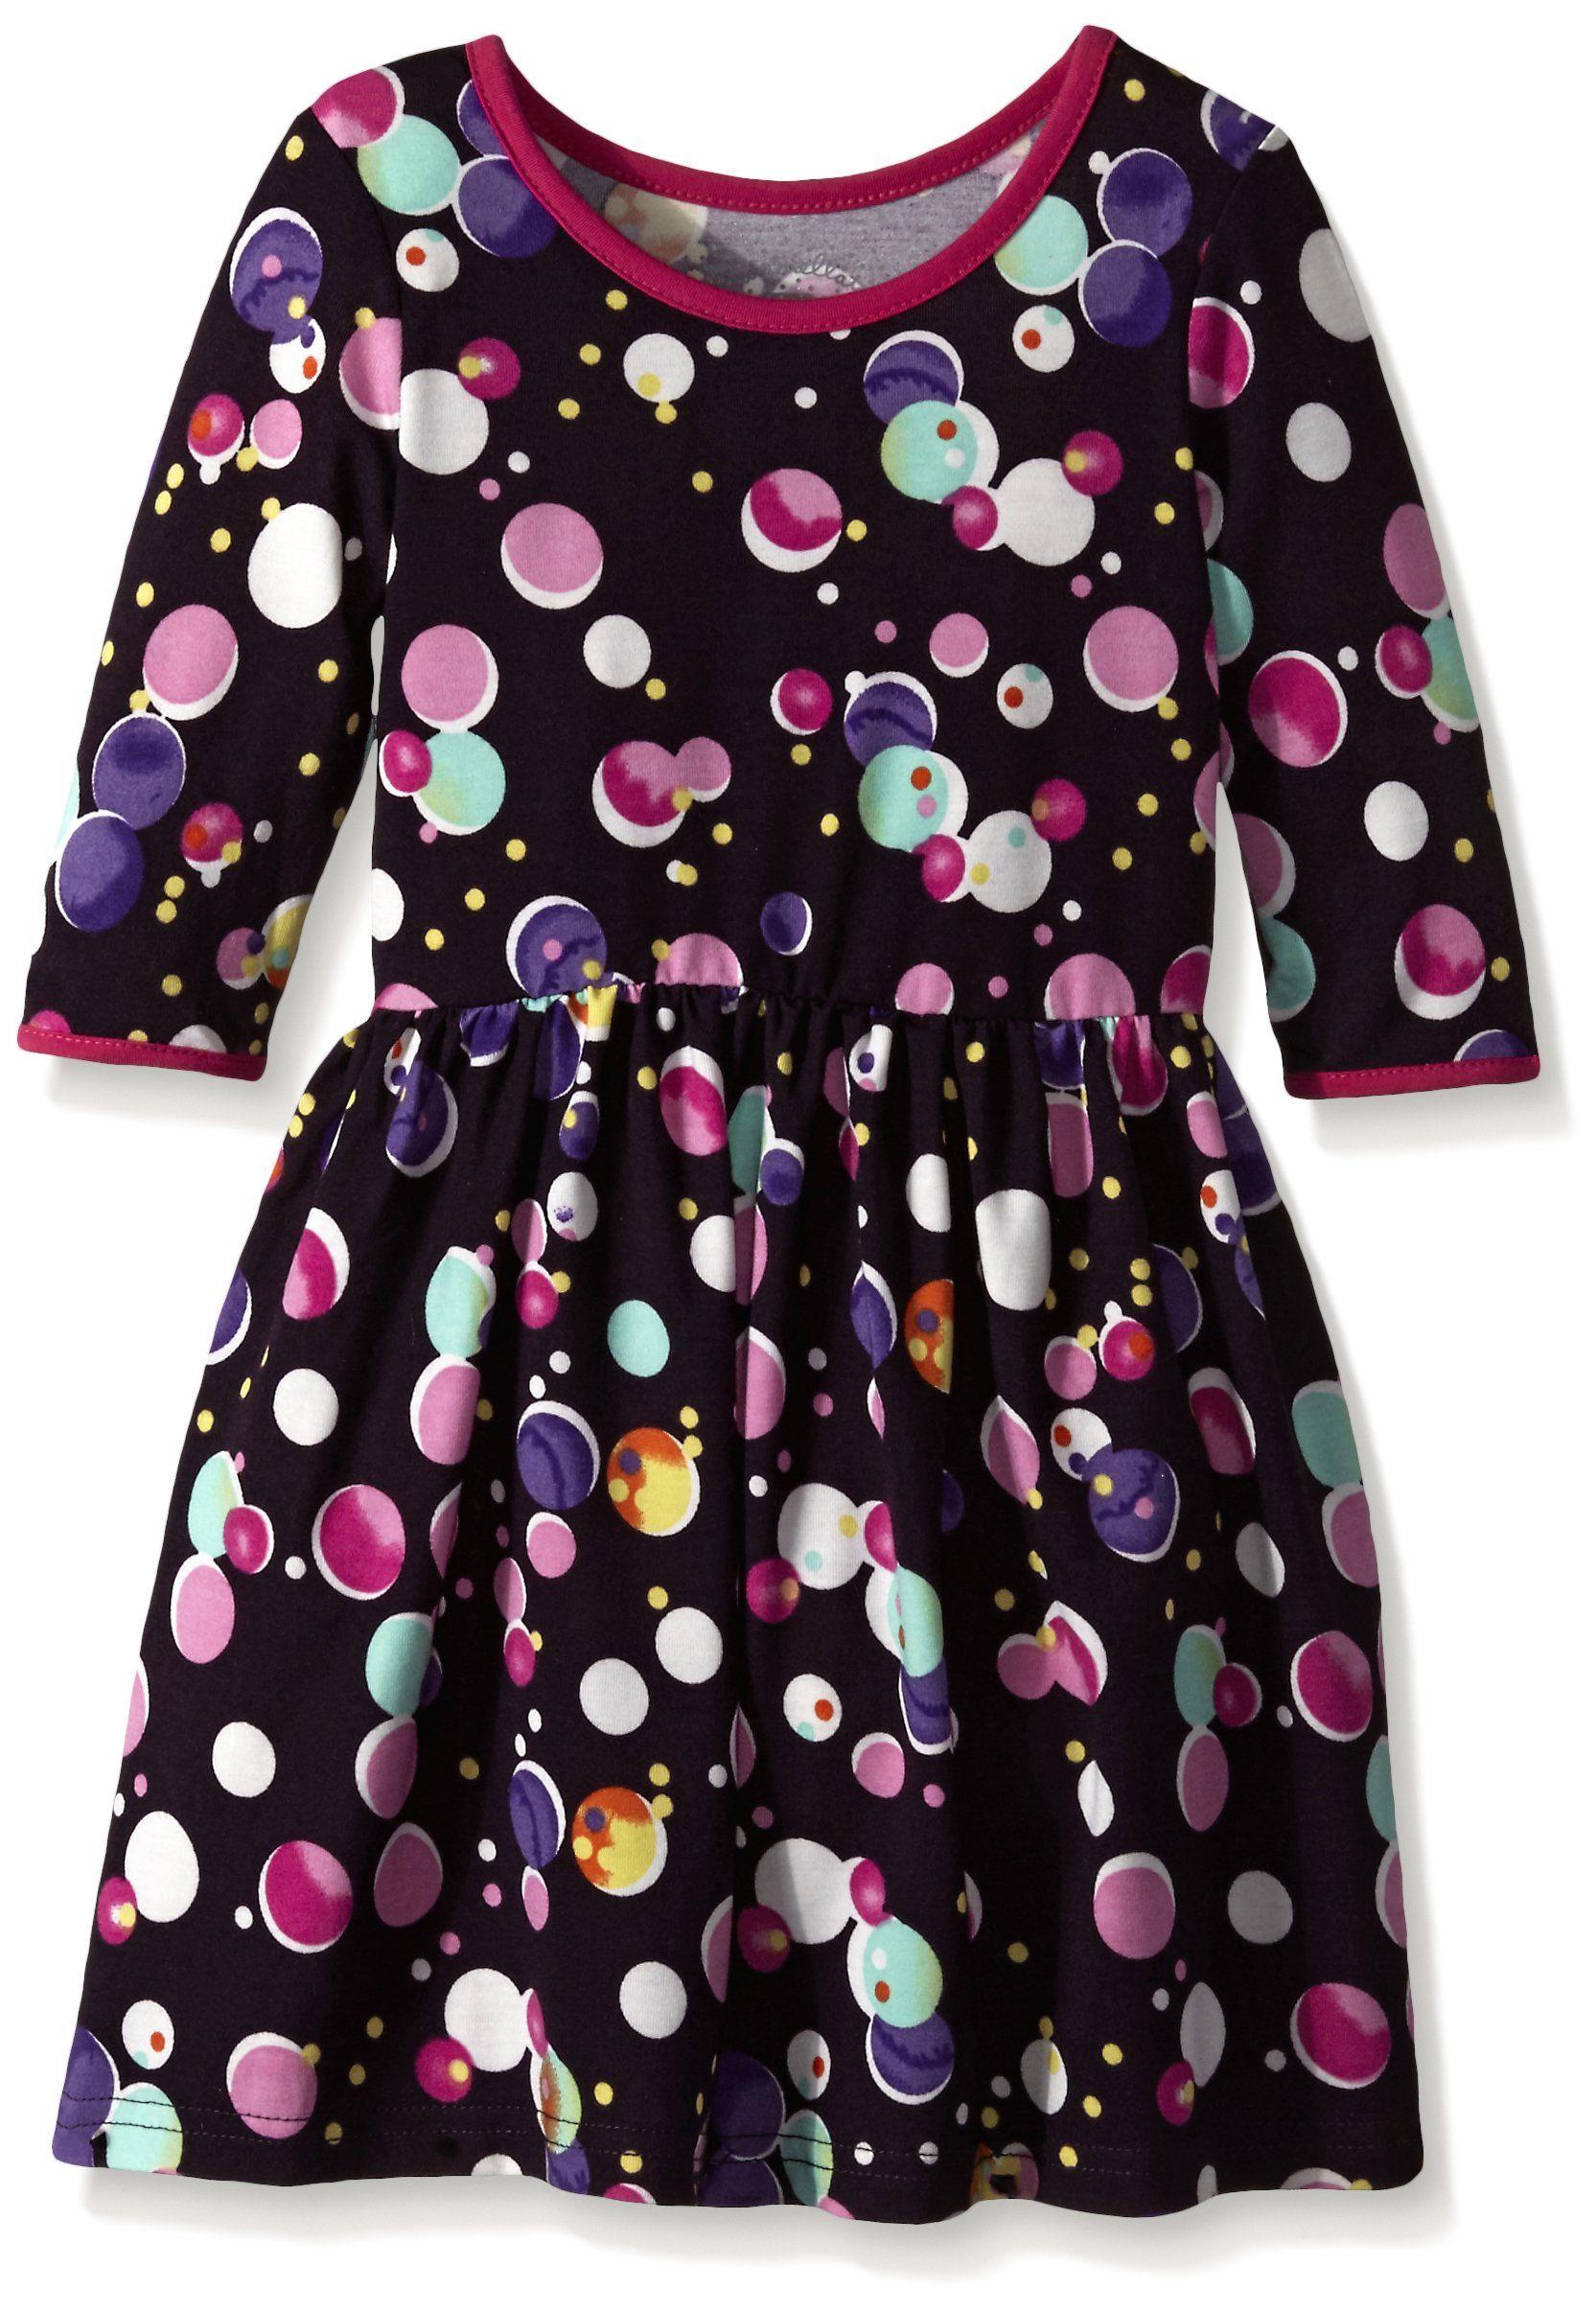 Marmellata Little Girls Toddler Bubble Print Knit Dress Multi 3T